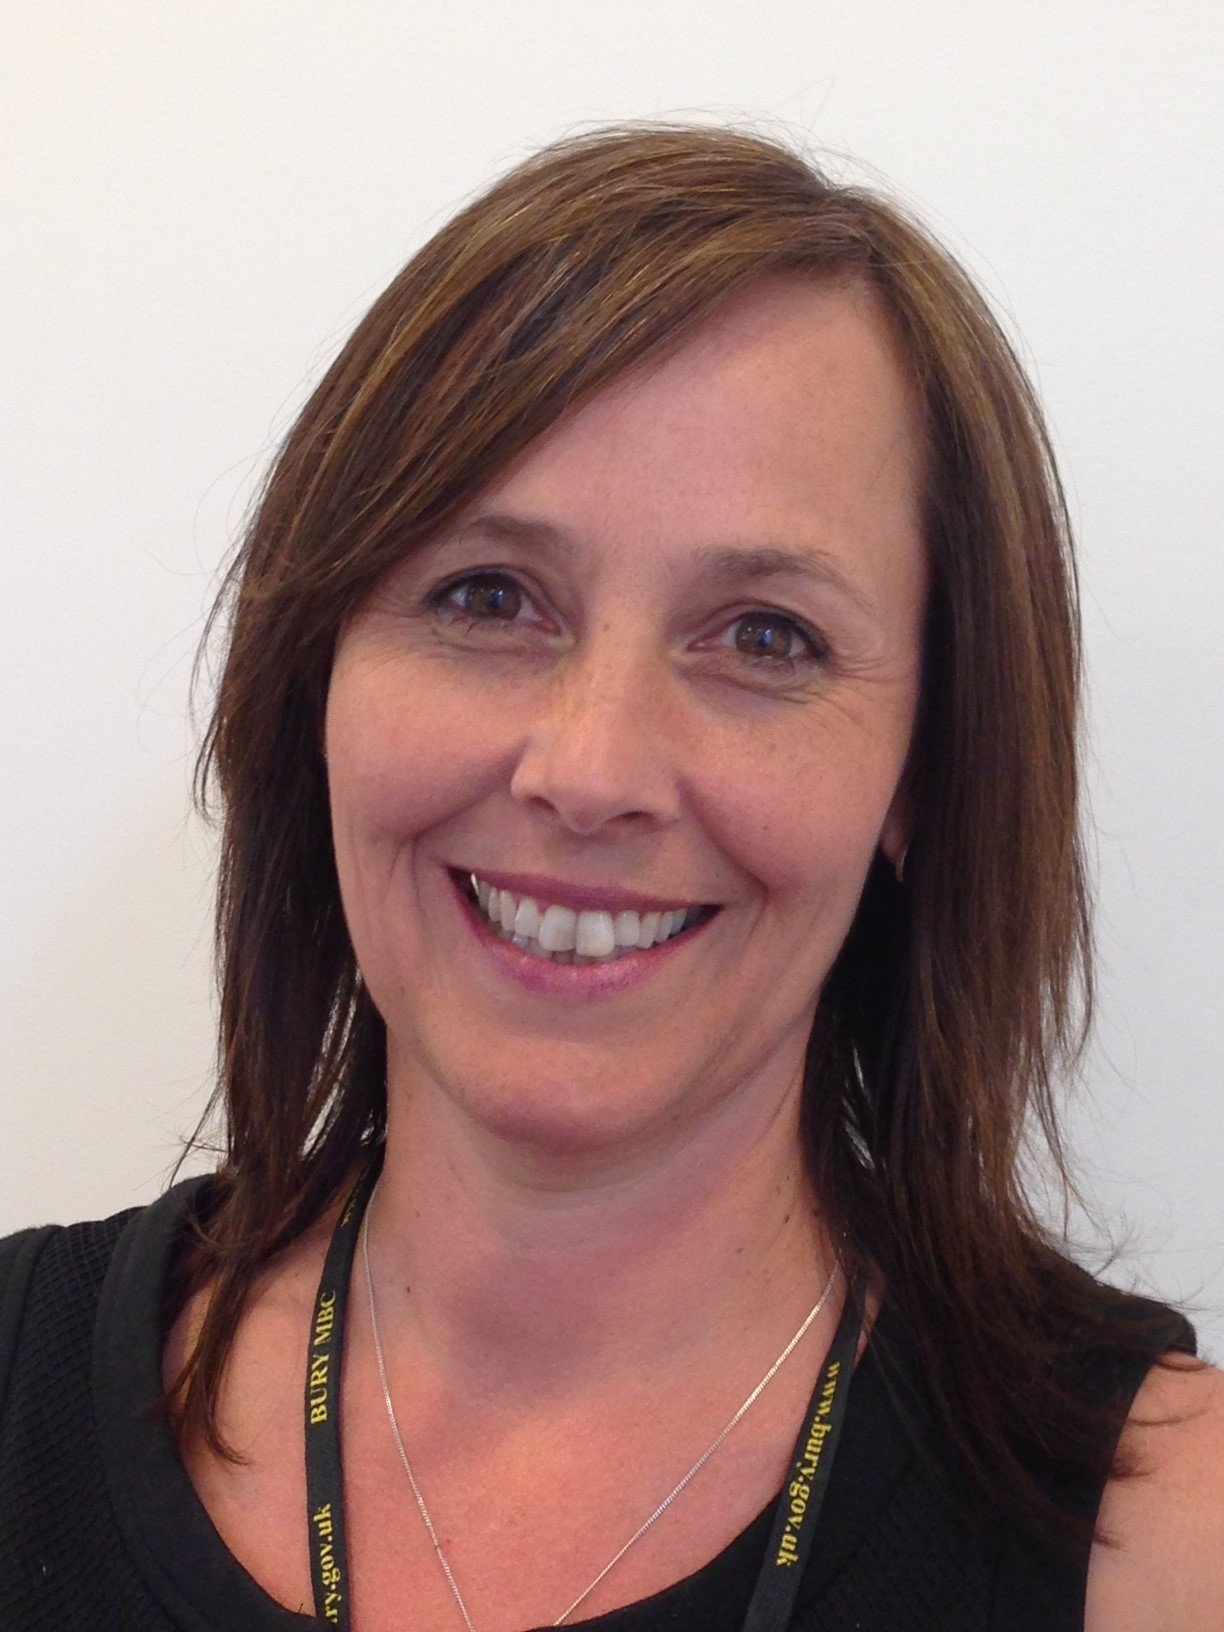 Interview with: Lesley Jones, Director of Public Health, Bury Council